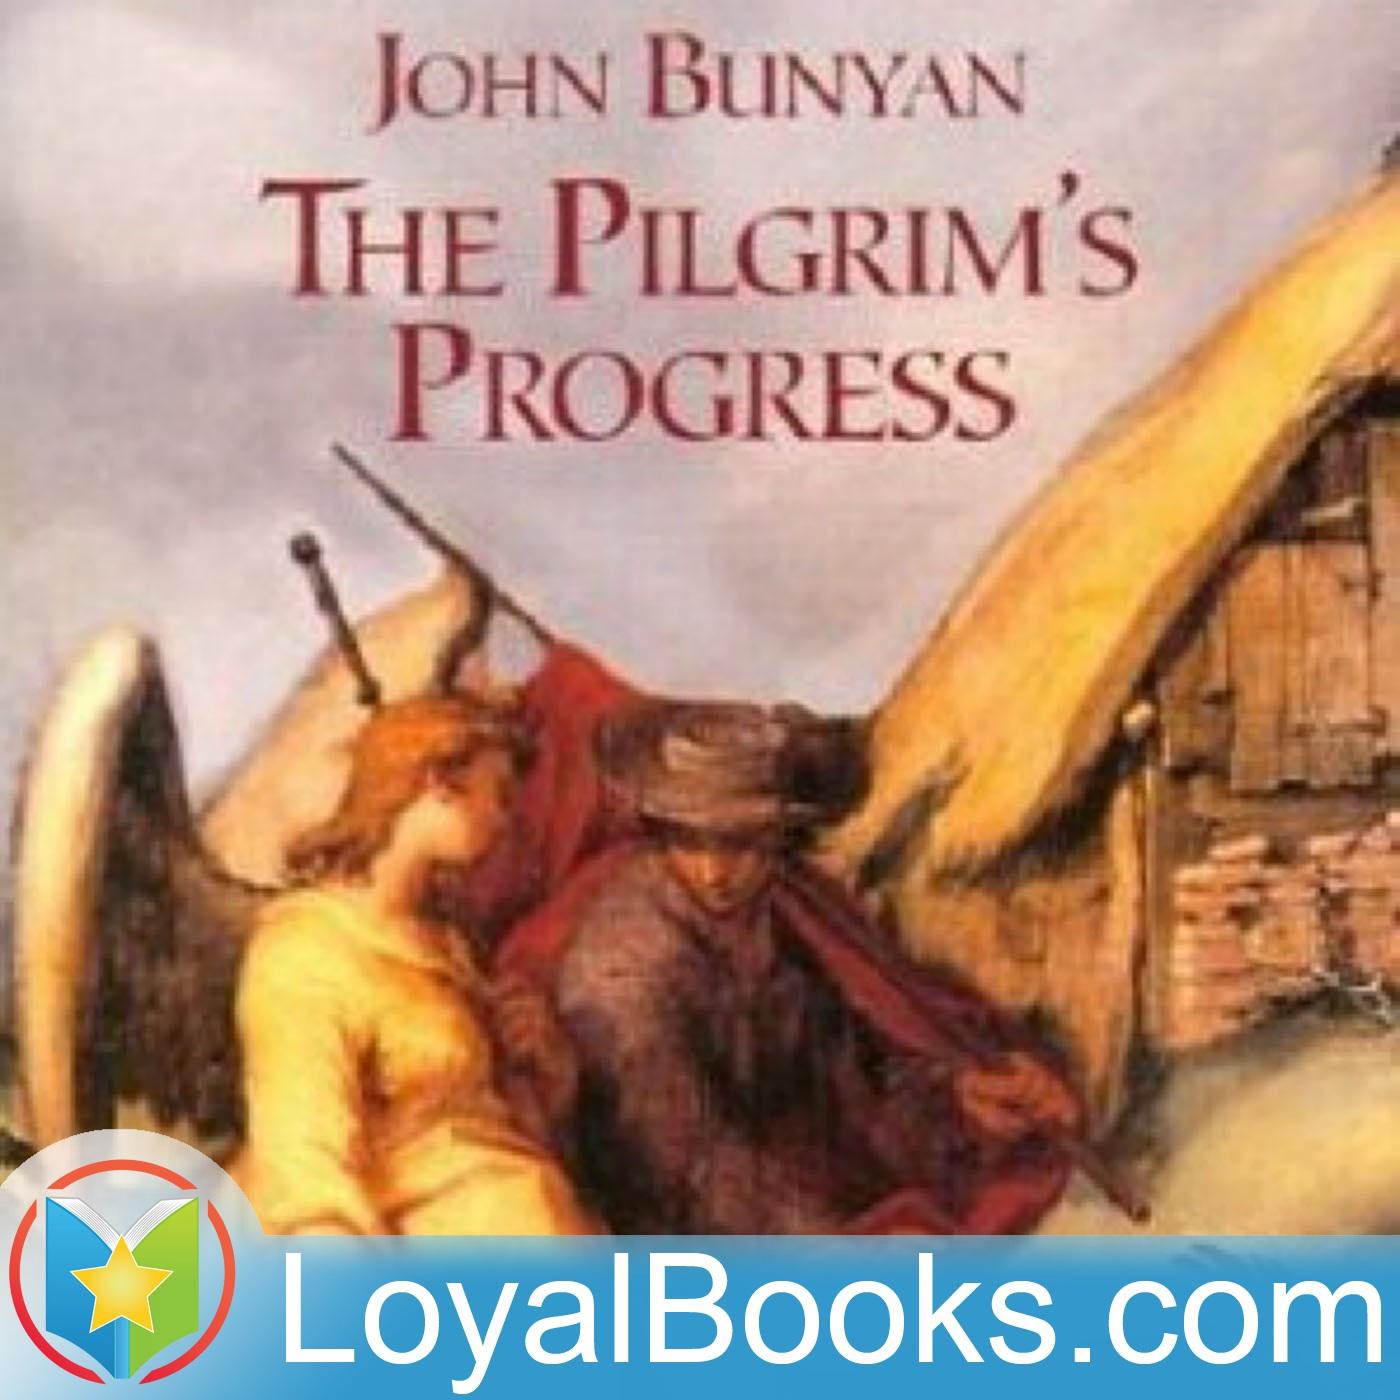 <![CDATA[The Pilgrim's Progress by John Bunyan]]>